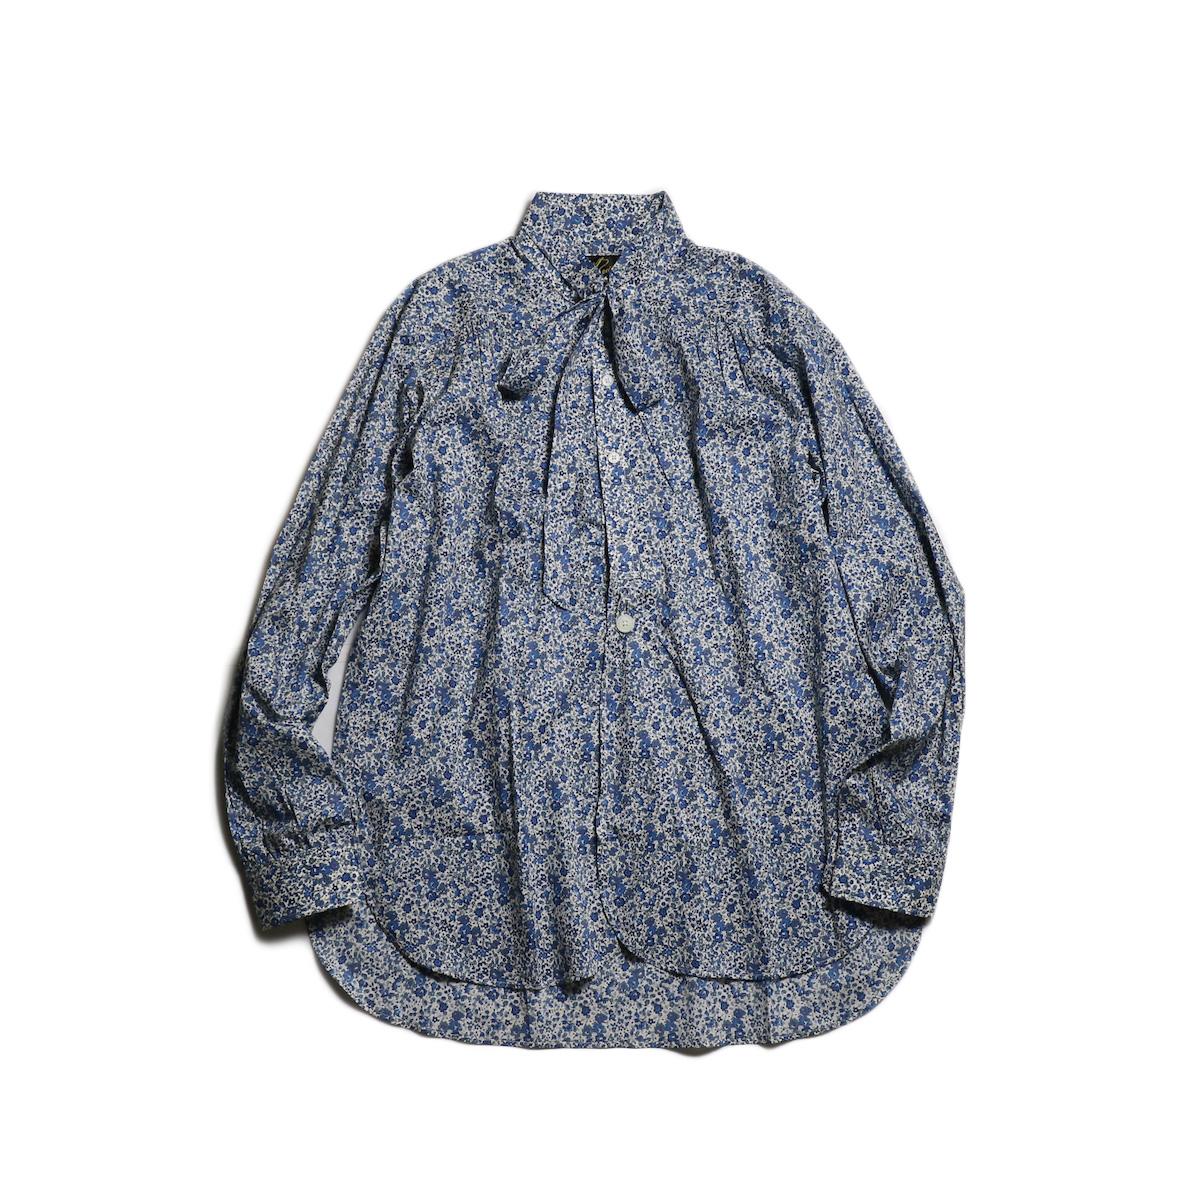 Needles / Ascot Collar EDW Gather Shirt -Liberty Print (Blue Flower)